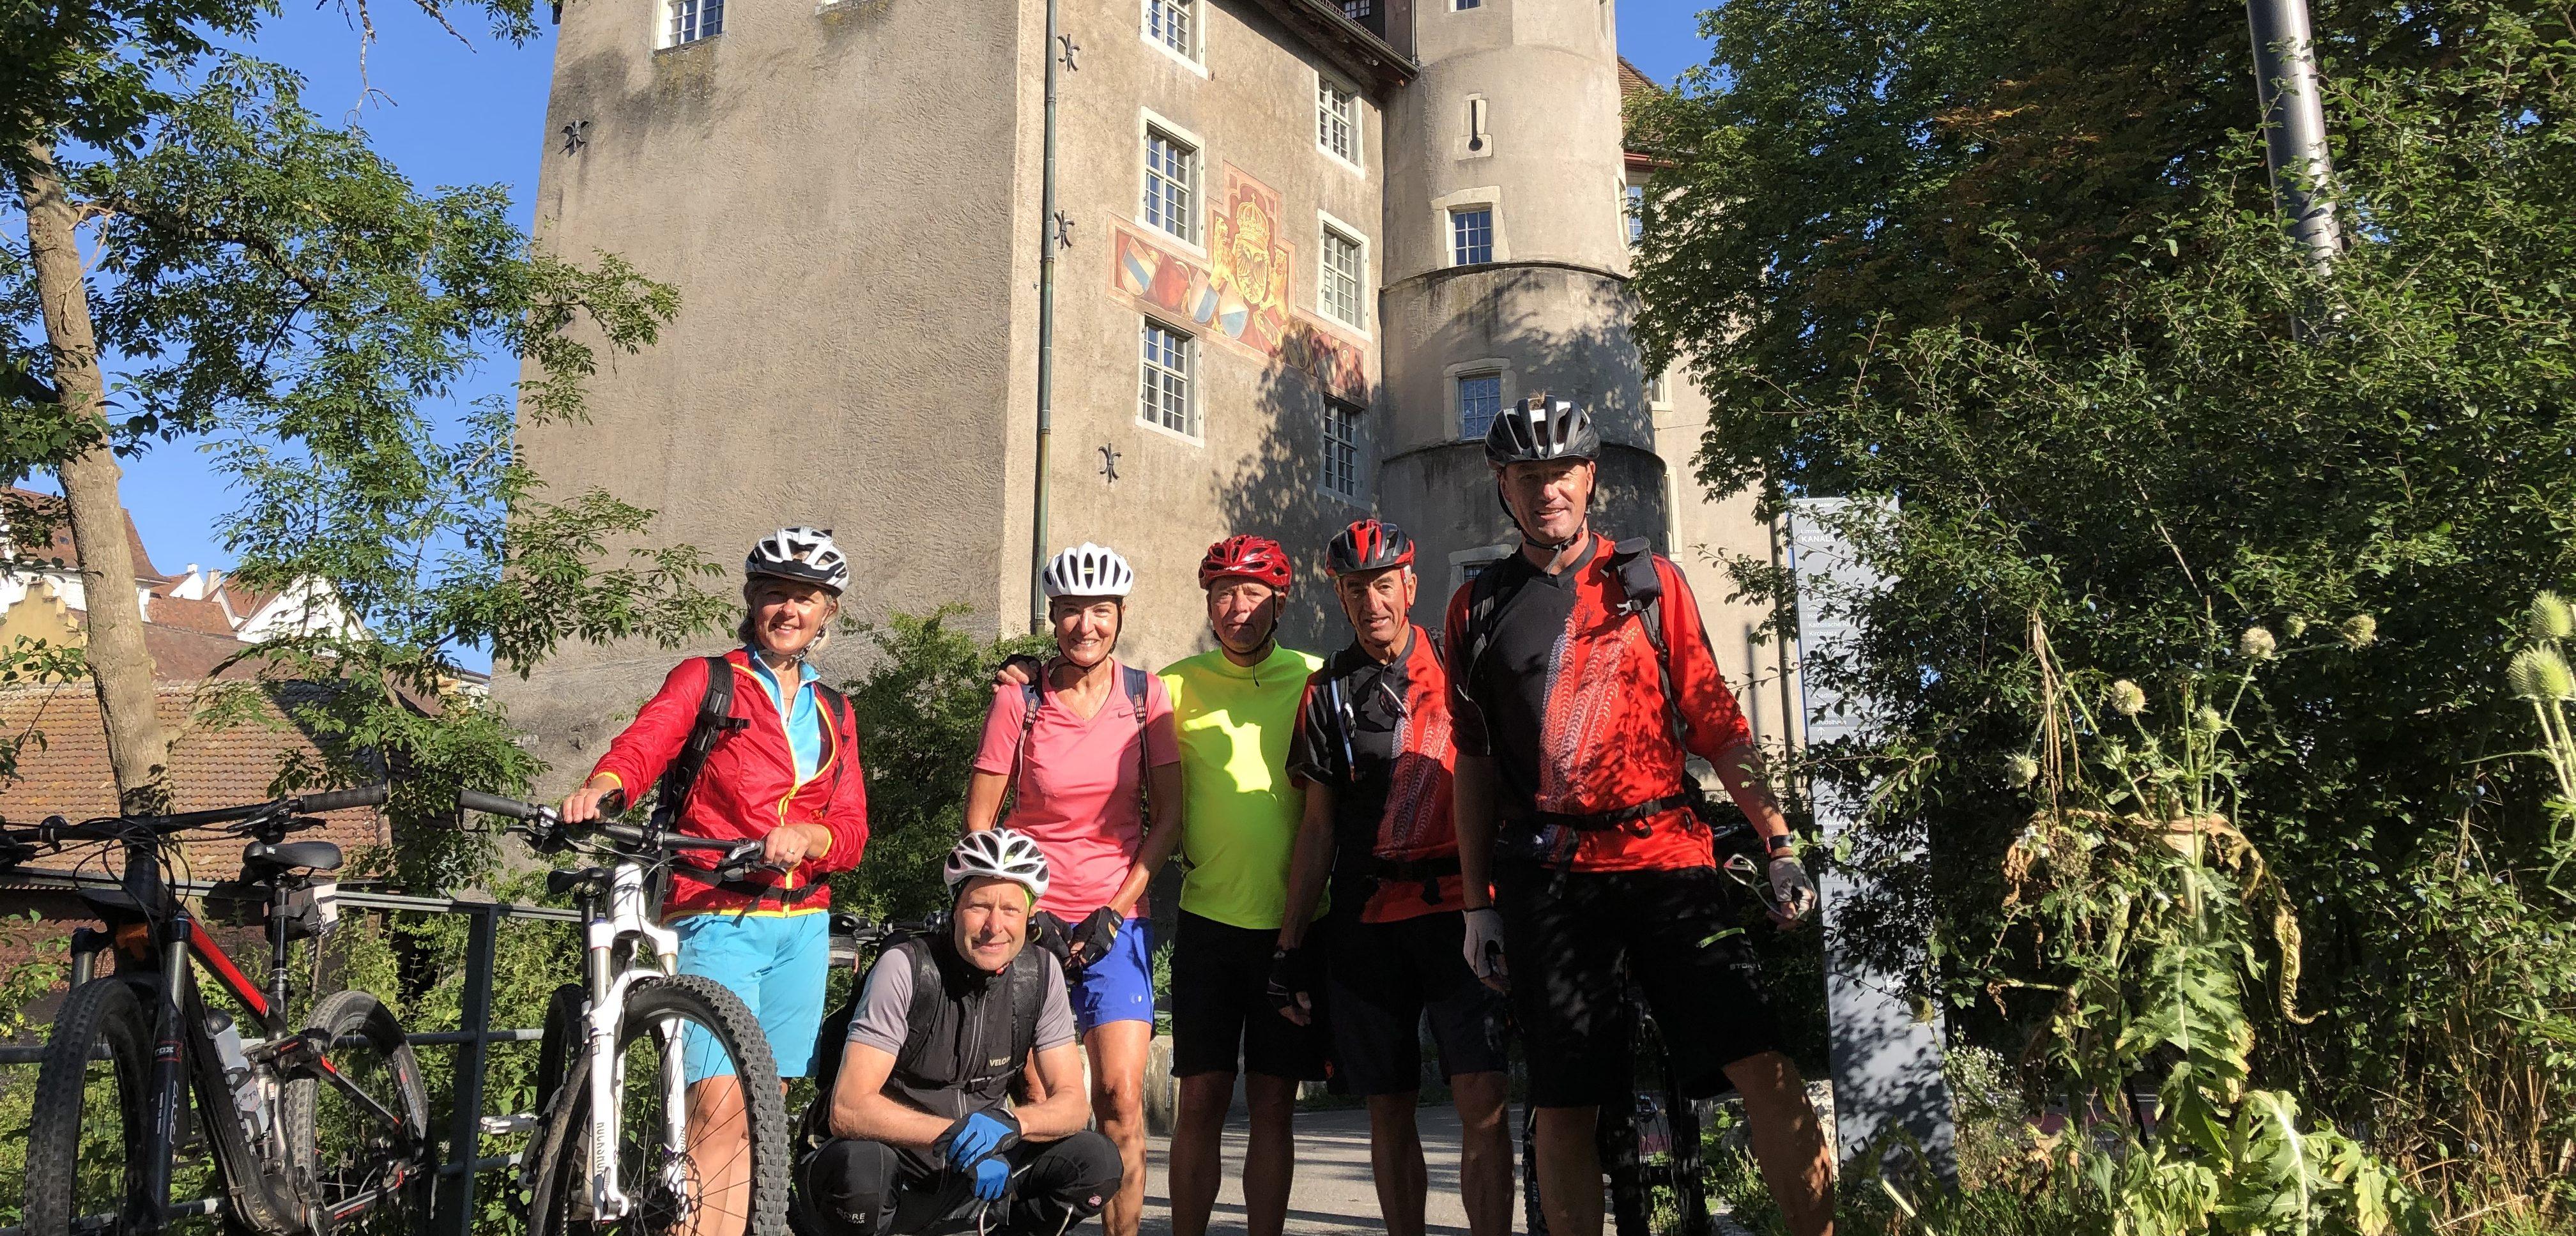 Biketour entlang der Aargauer Schlösser